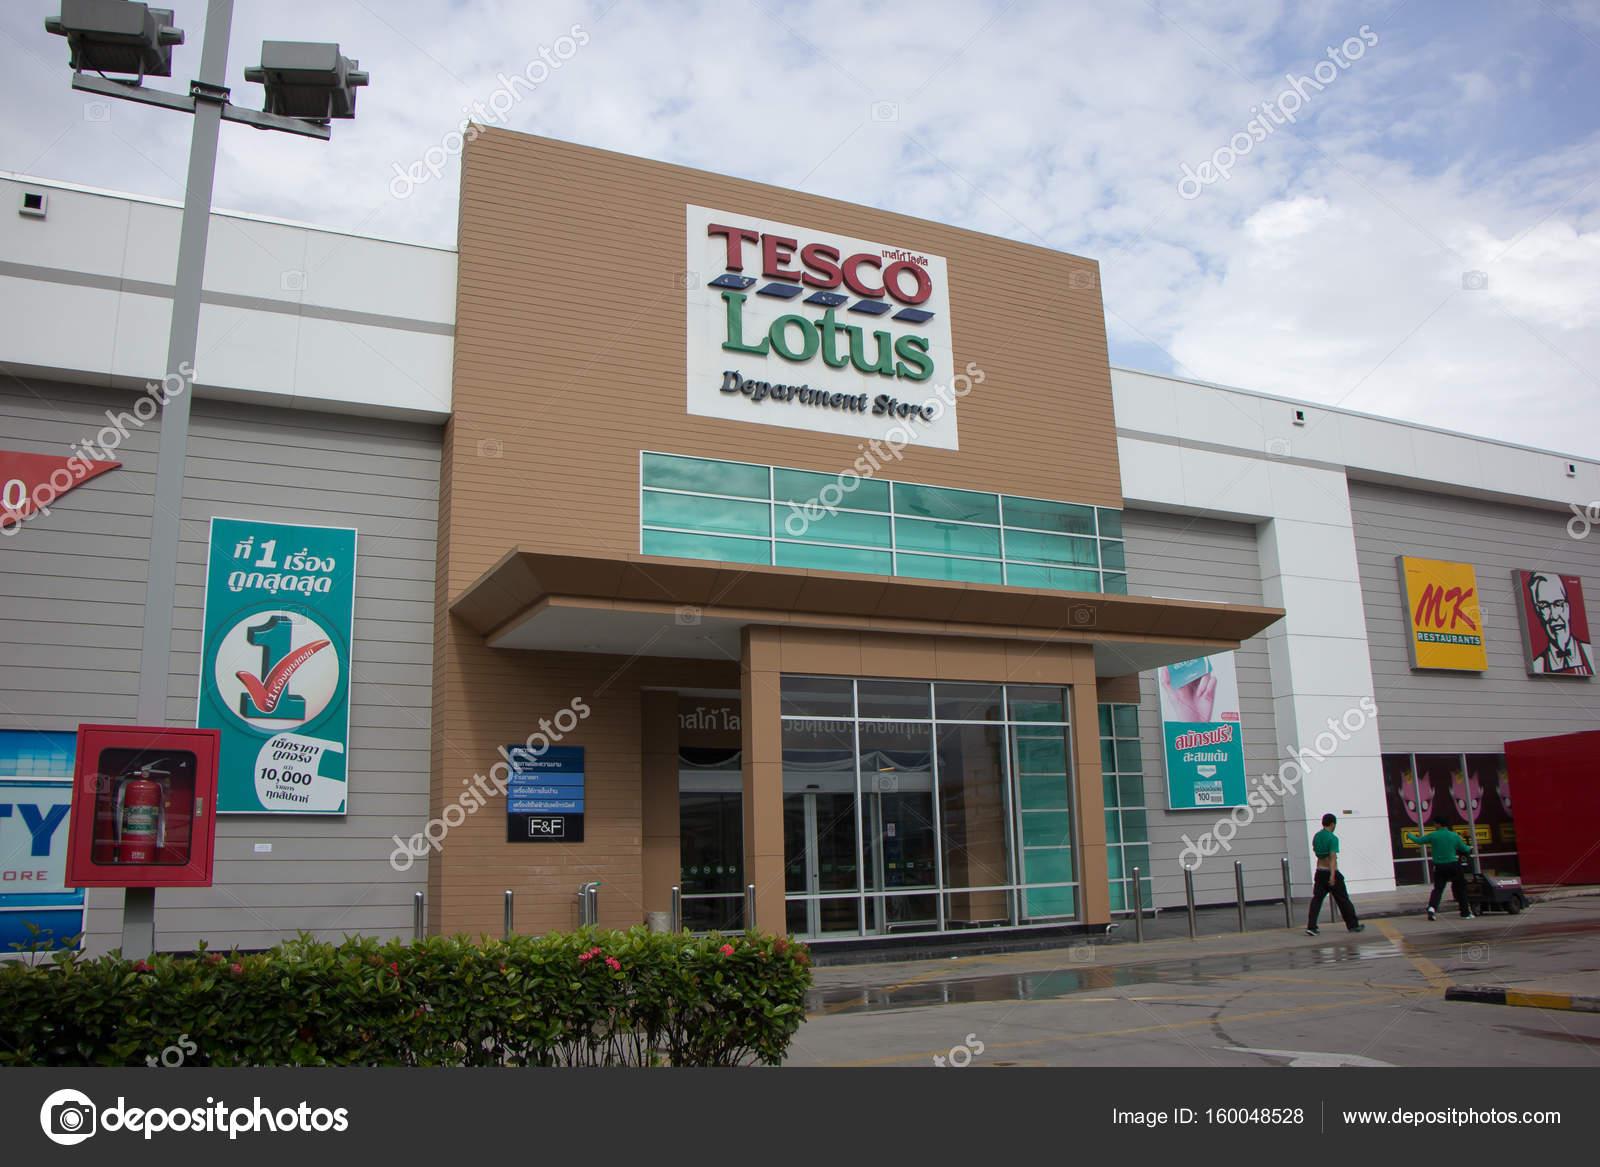 Tesco Lotus Hyper Market Meechok – Stock Editorial Photo